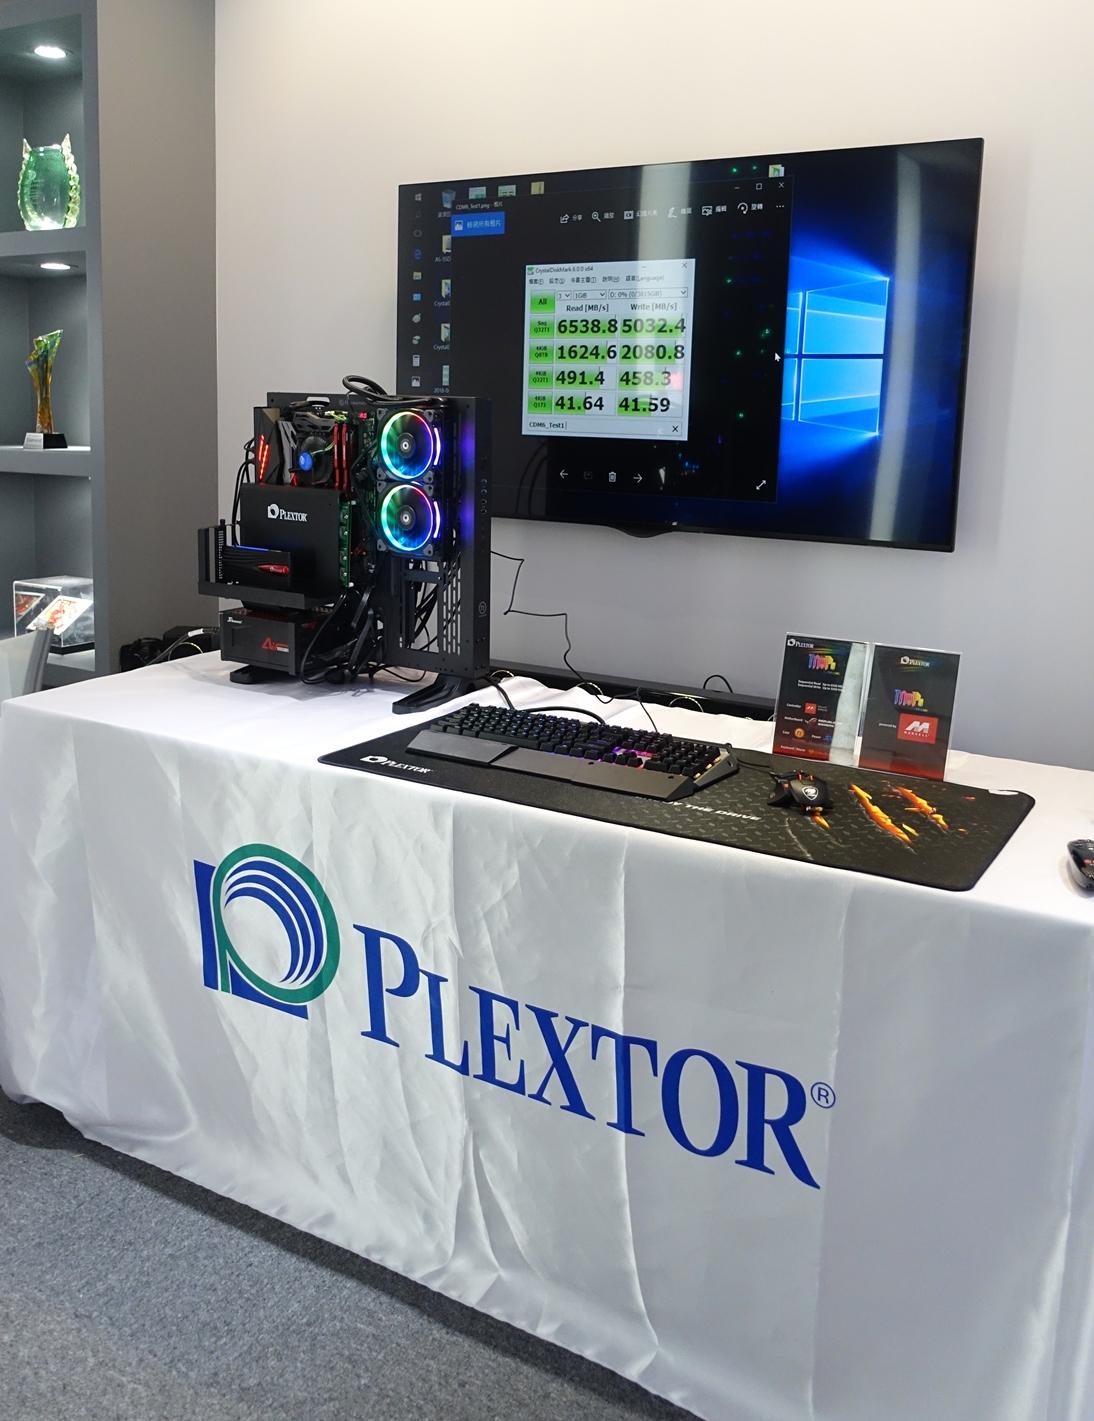 01m9pe extreme demo Plextor เปิดตัว SSD รุ่นใหม่ล่าสุด M9Pe Extreme  Ultra Hi Speed NVMe SSD ที่งานคอมพิวเทค ประเทศไต้หวัน